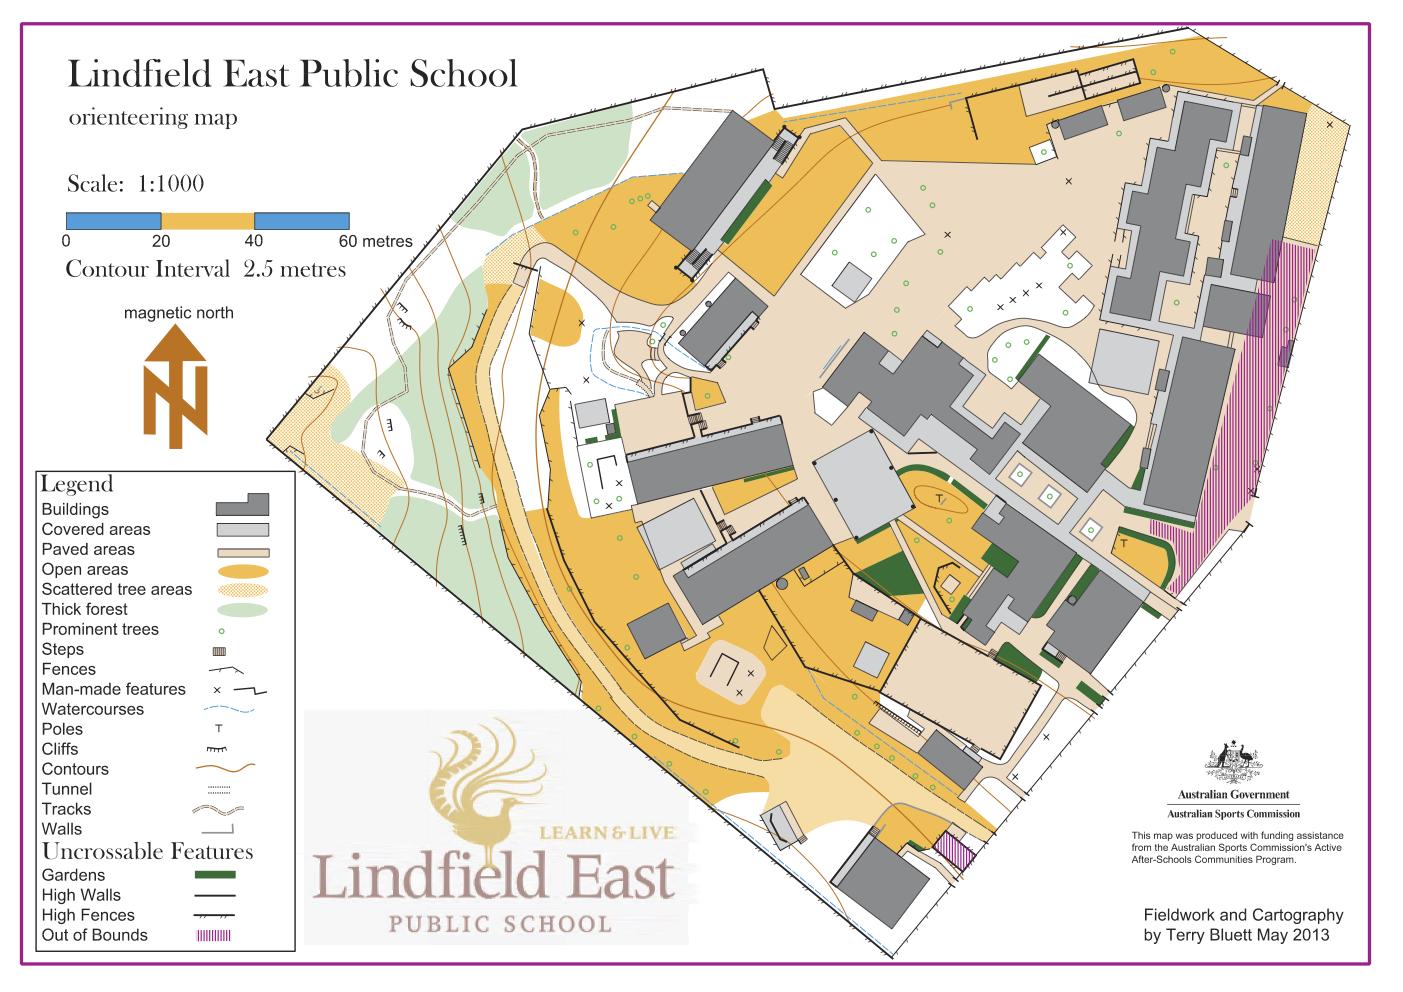 full size school map